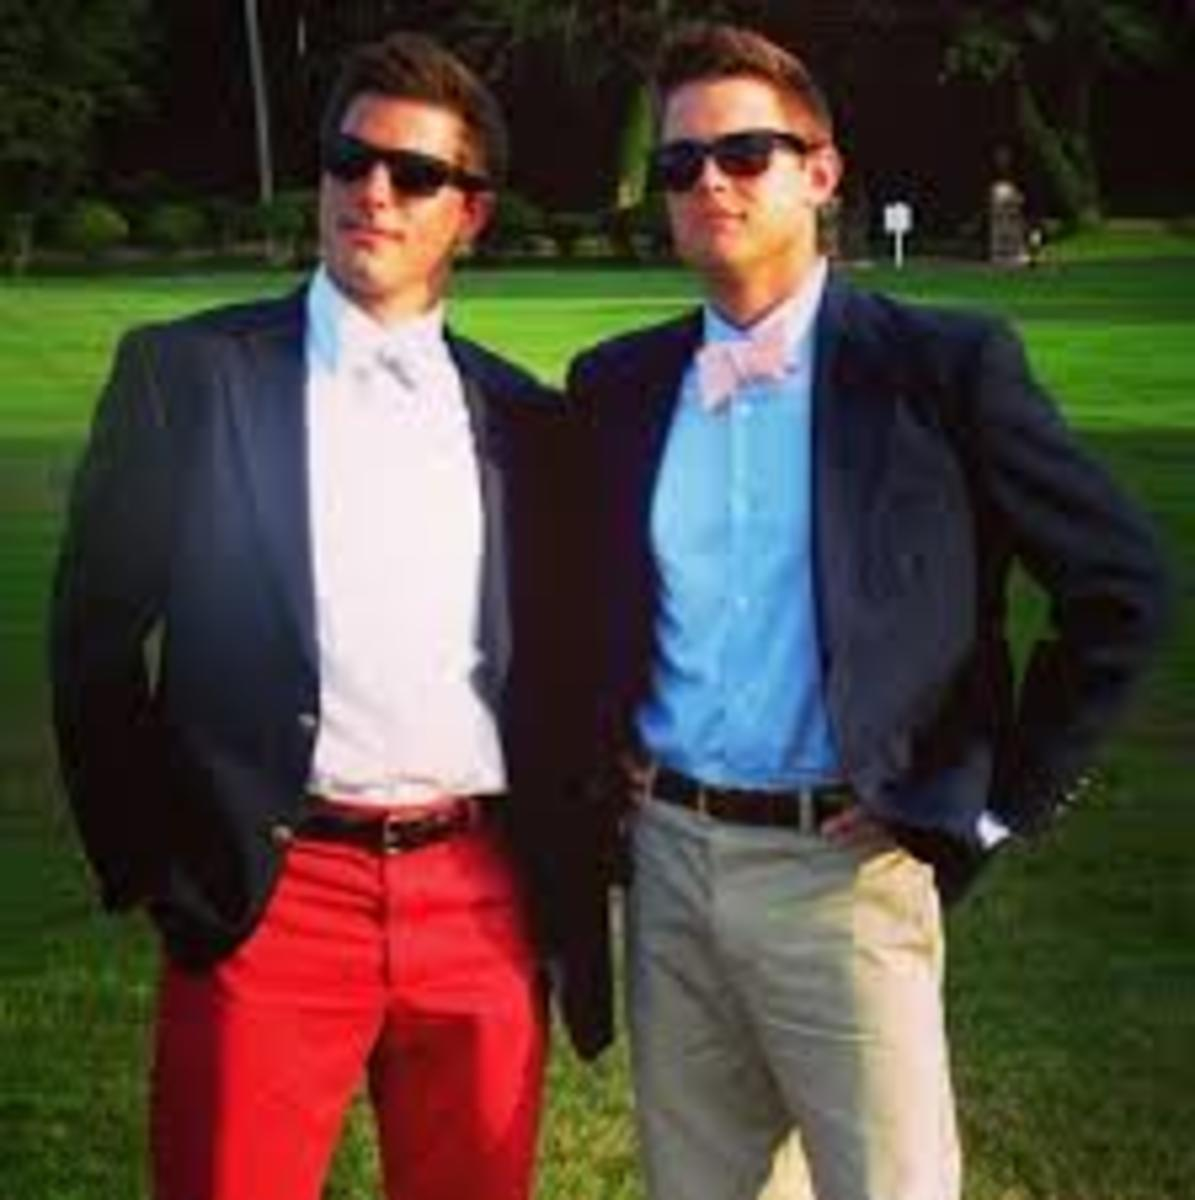 The Southern Frat Star: 10 Wardrobe Essentials